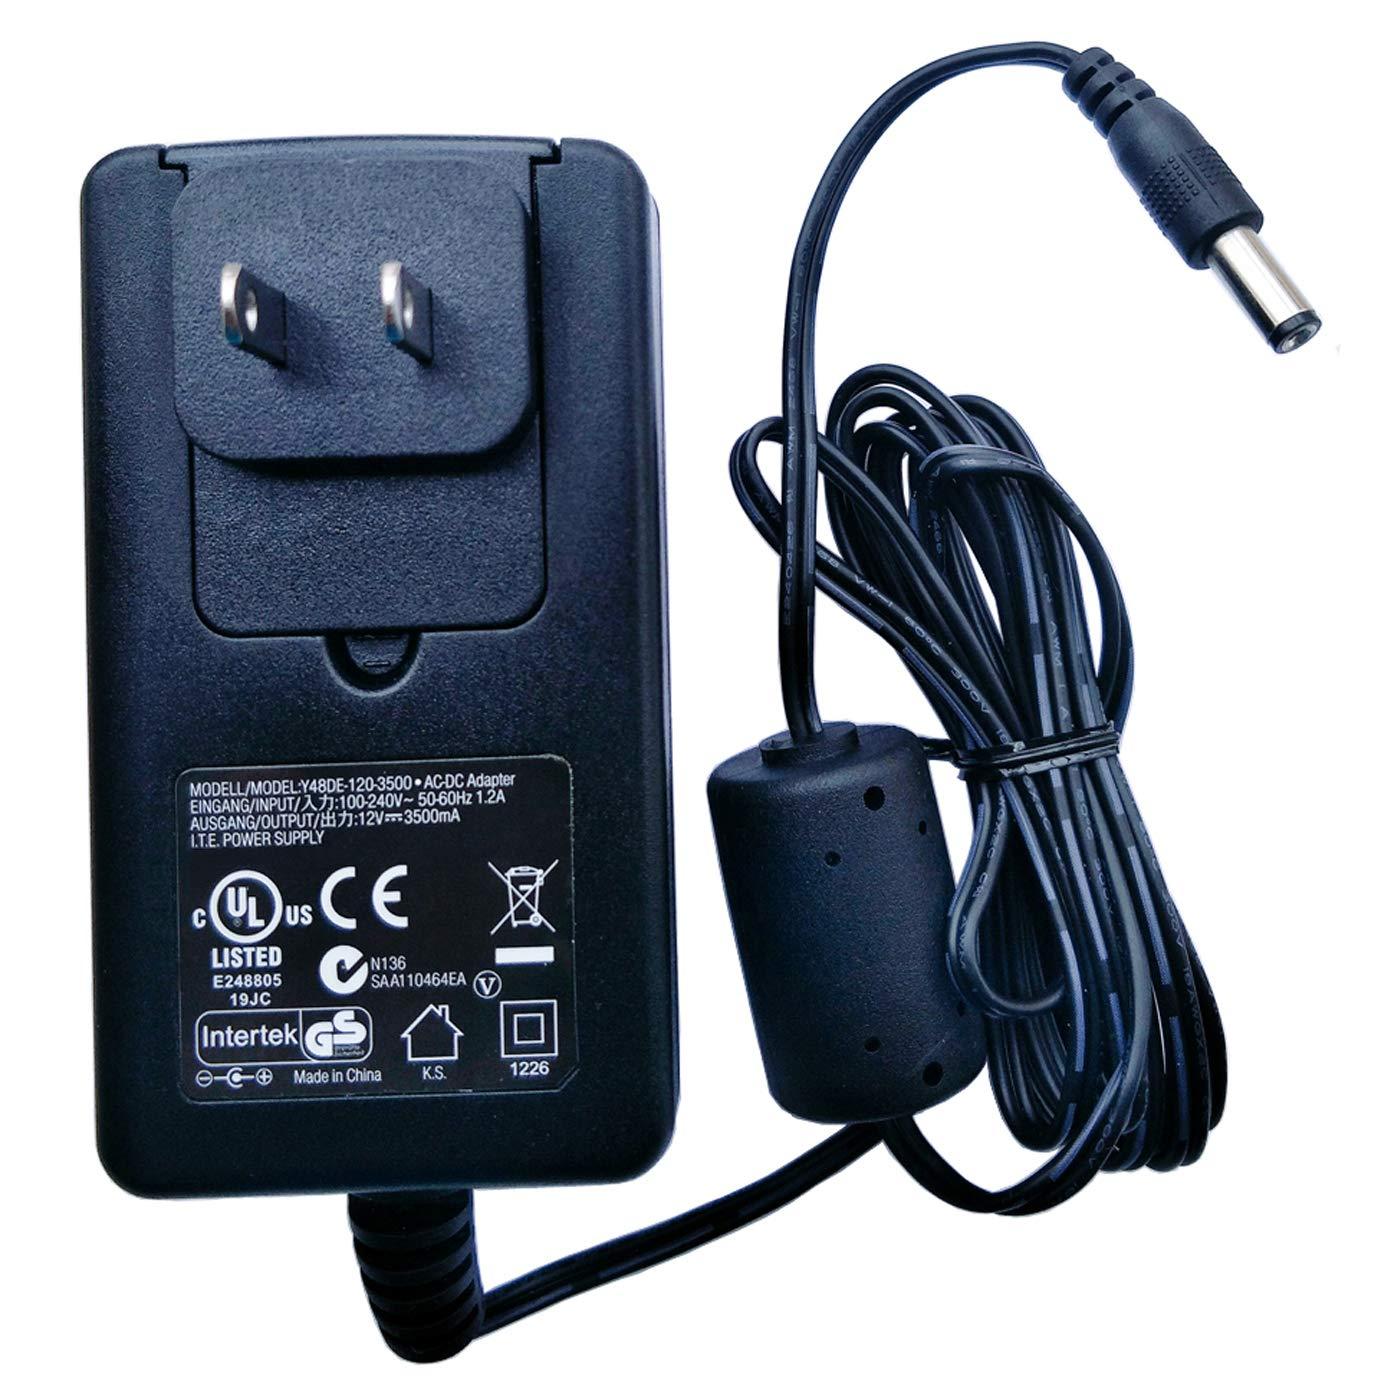 12 Volt Power Supply - 3.5 Amp Standard (12V 3.5A DC) Adapter